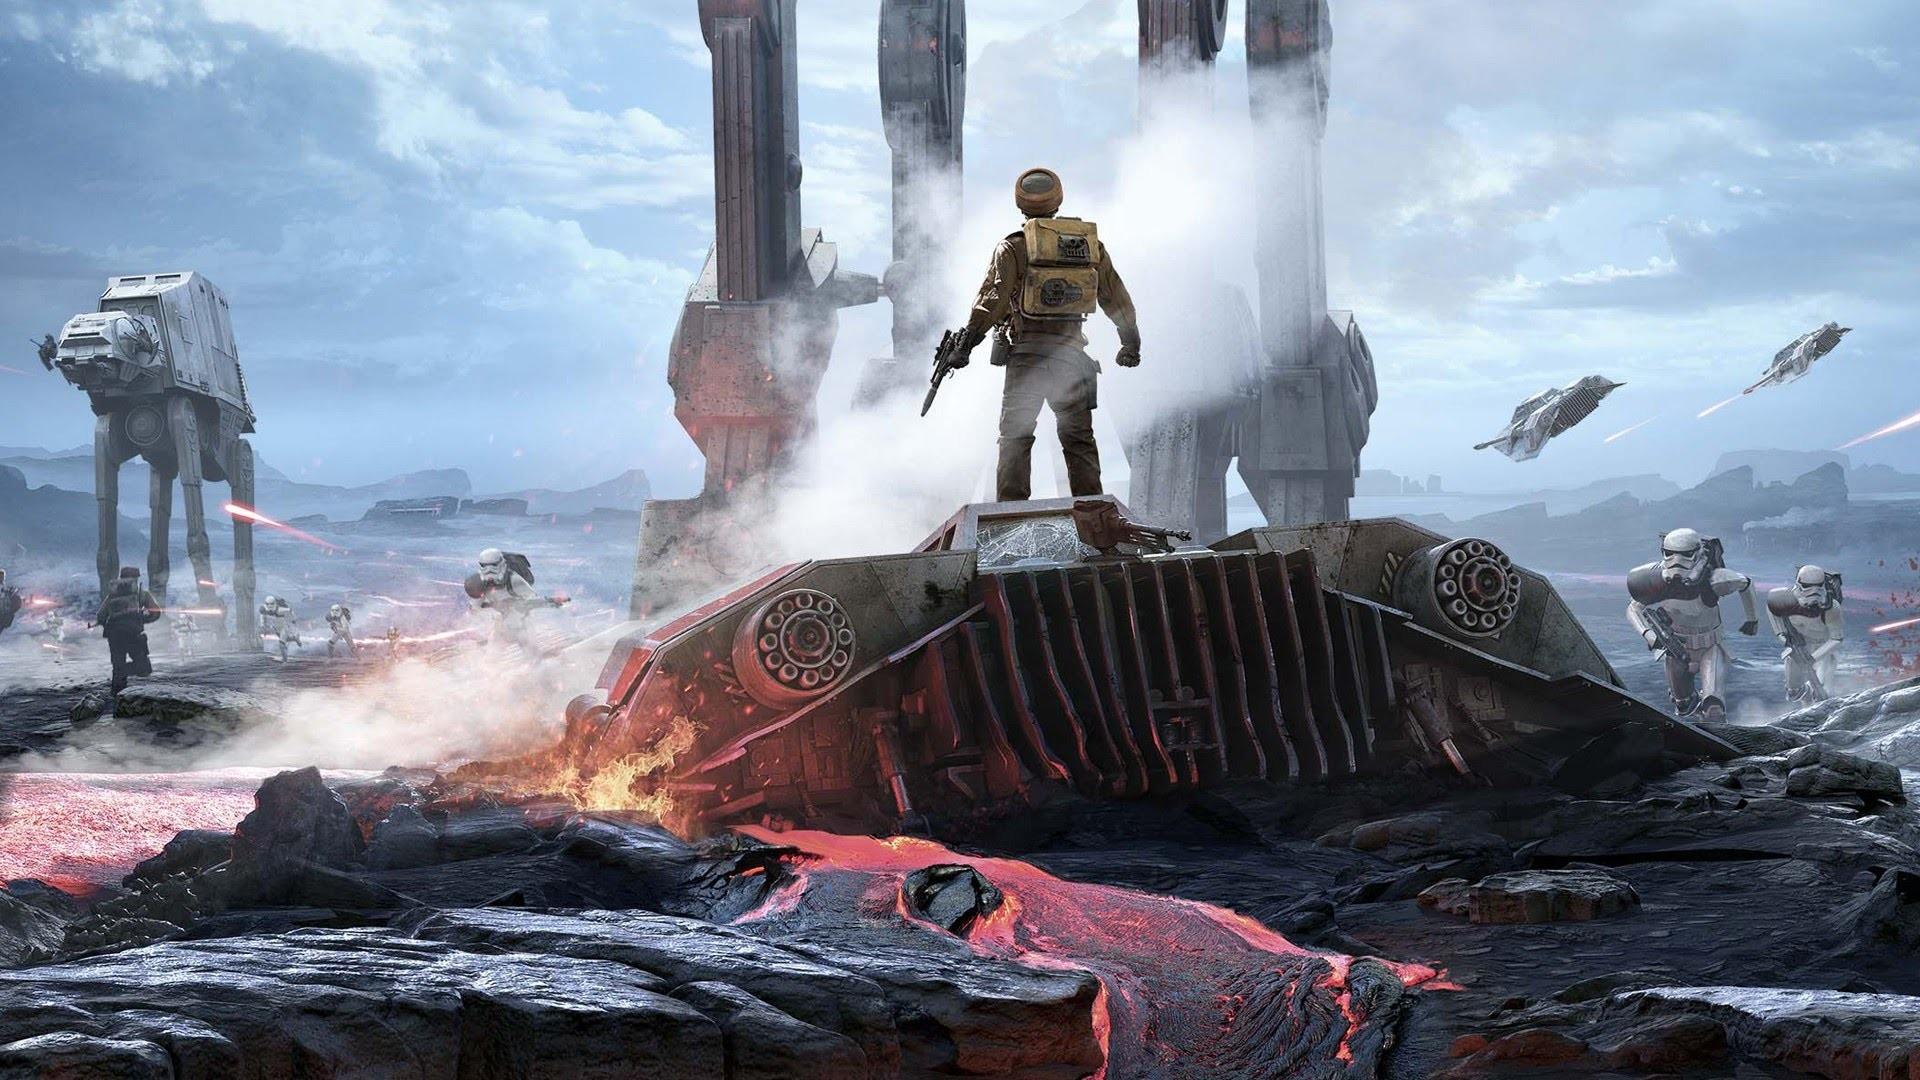 Star Wars Battlefront Wallpapers 1080p (82+ images)